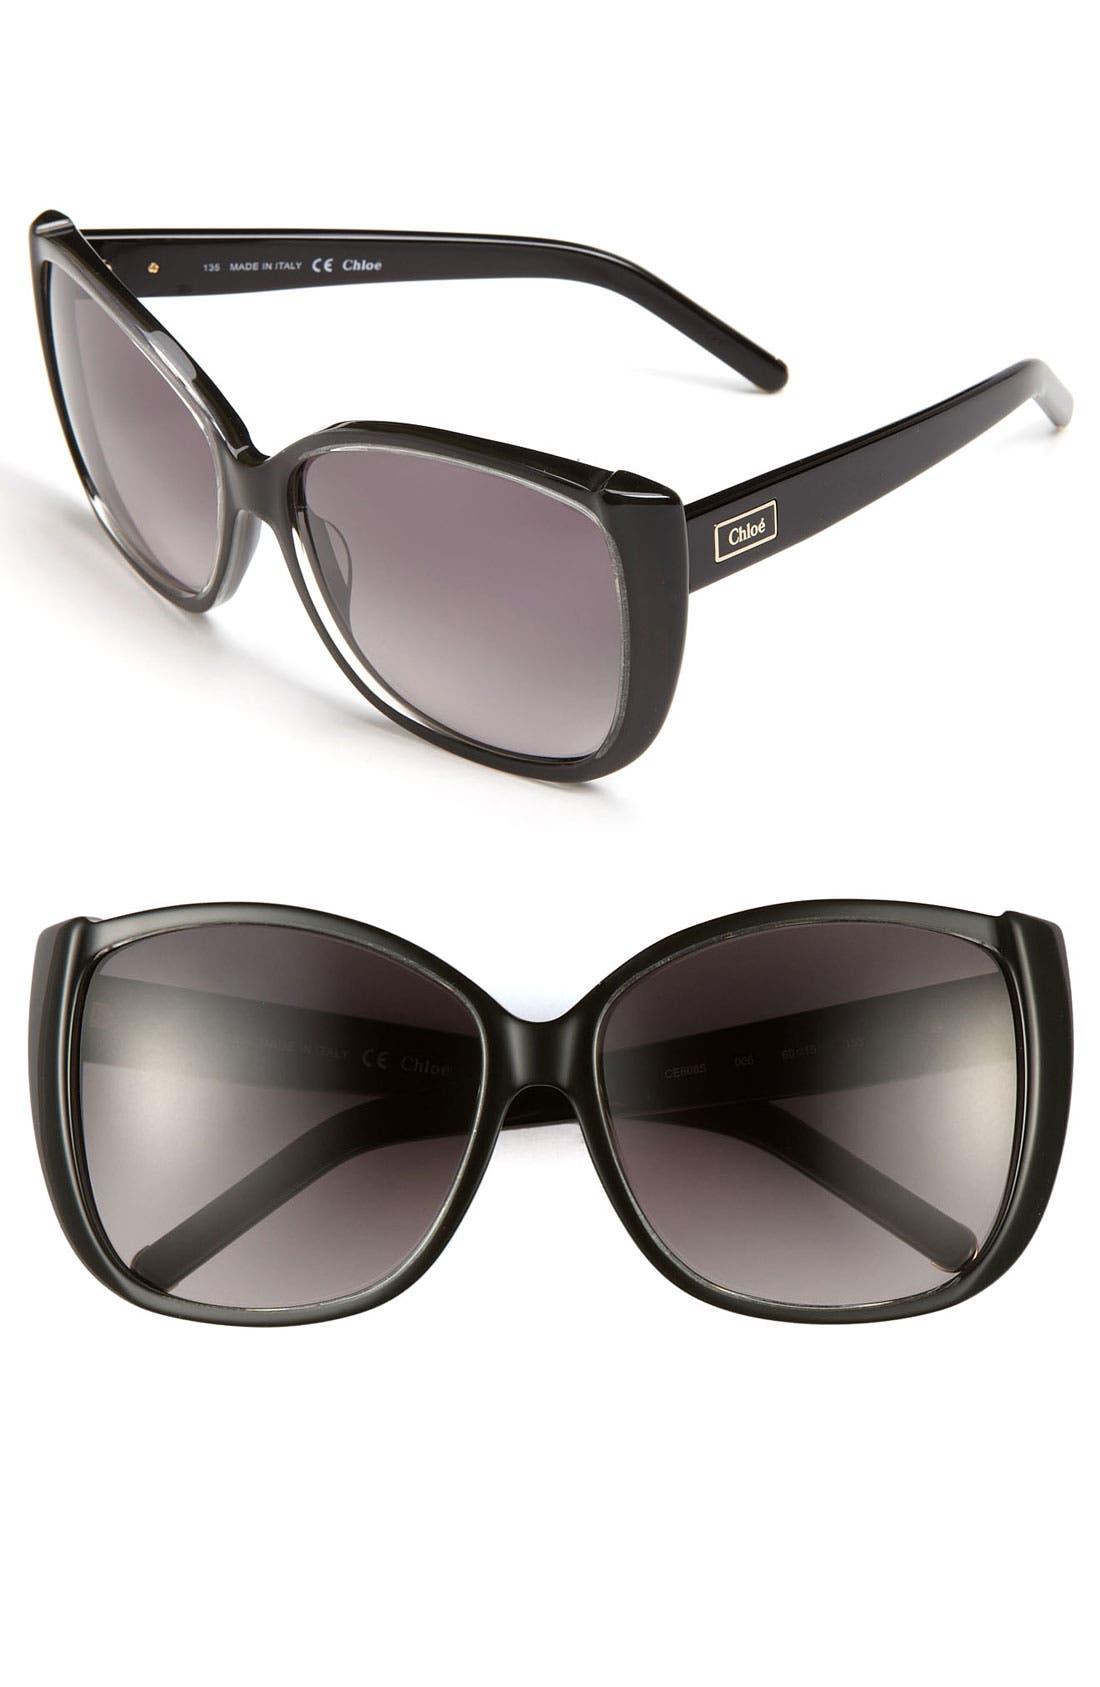 Main Image - Chloé 60mm Oversized Sunglasses